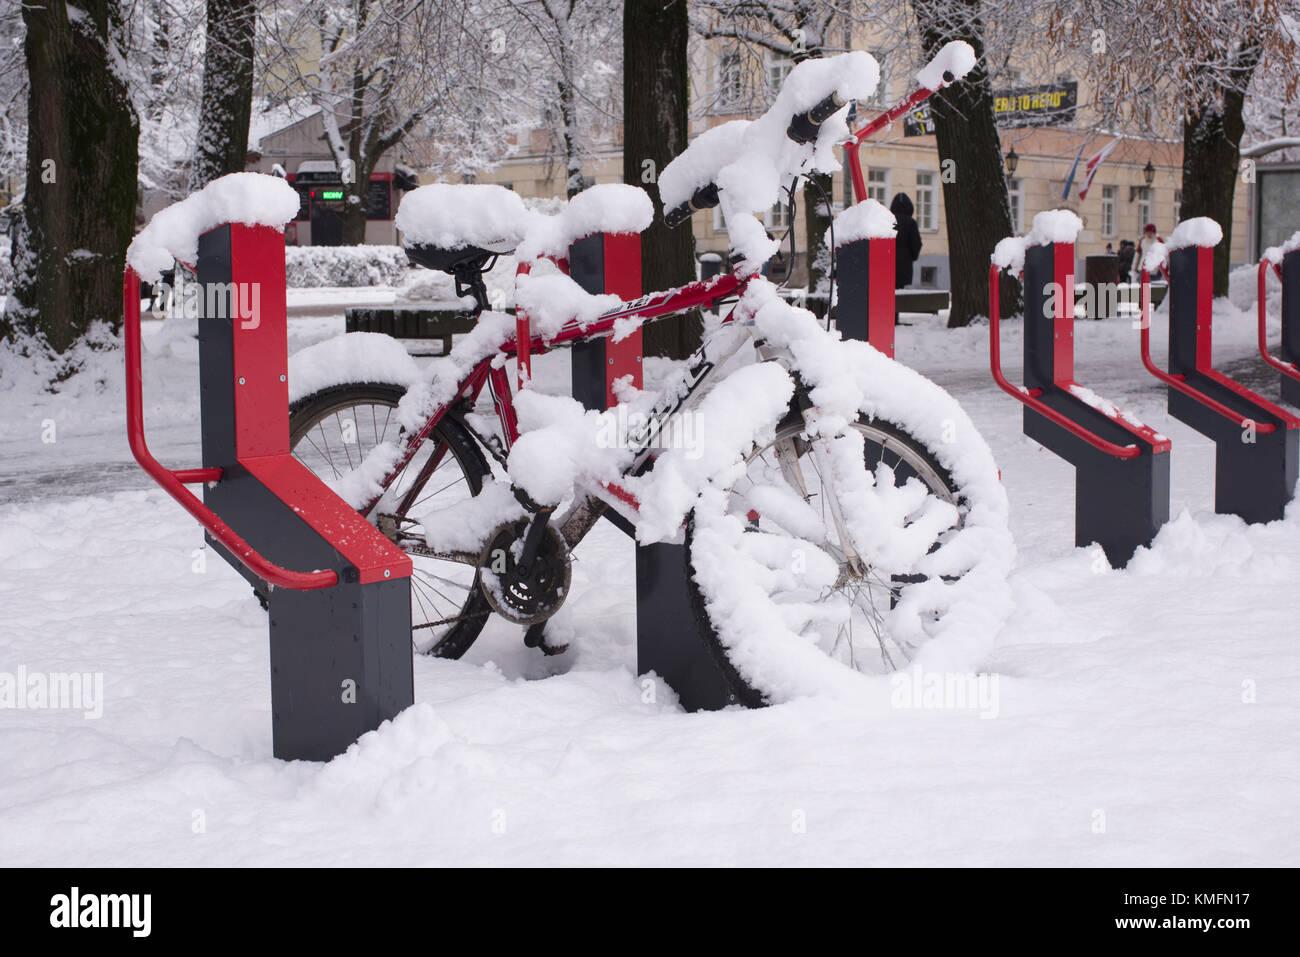 The snowy bike smart parking lot. Tartu, Estonia 6th Detsember 2017 - Stock Image